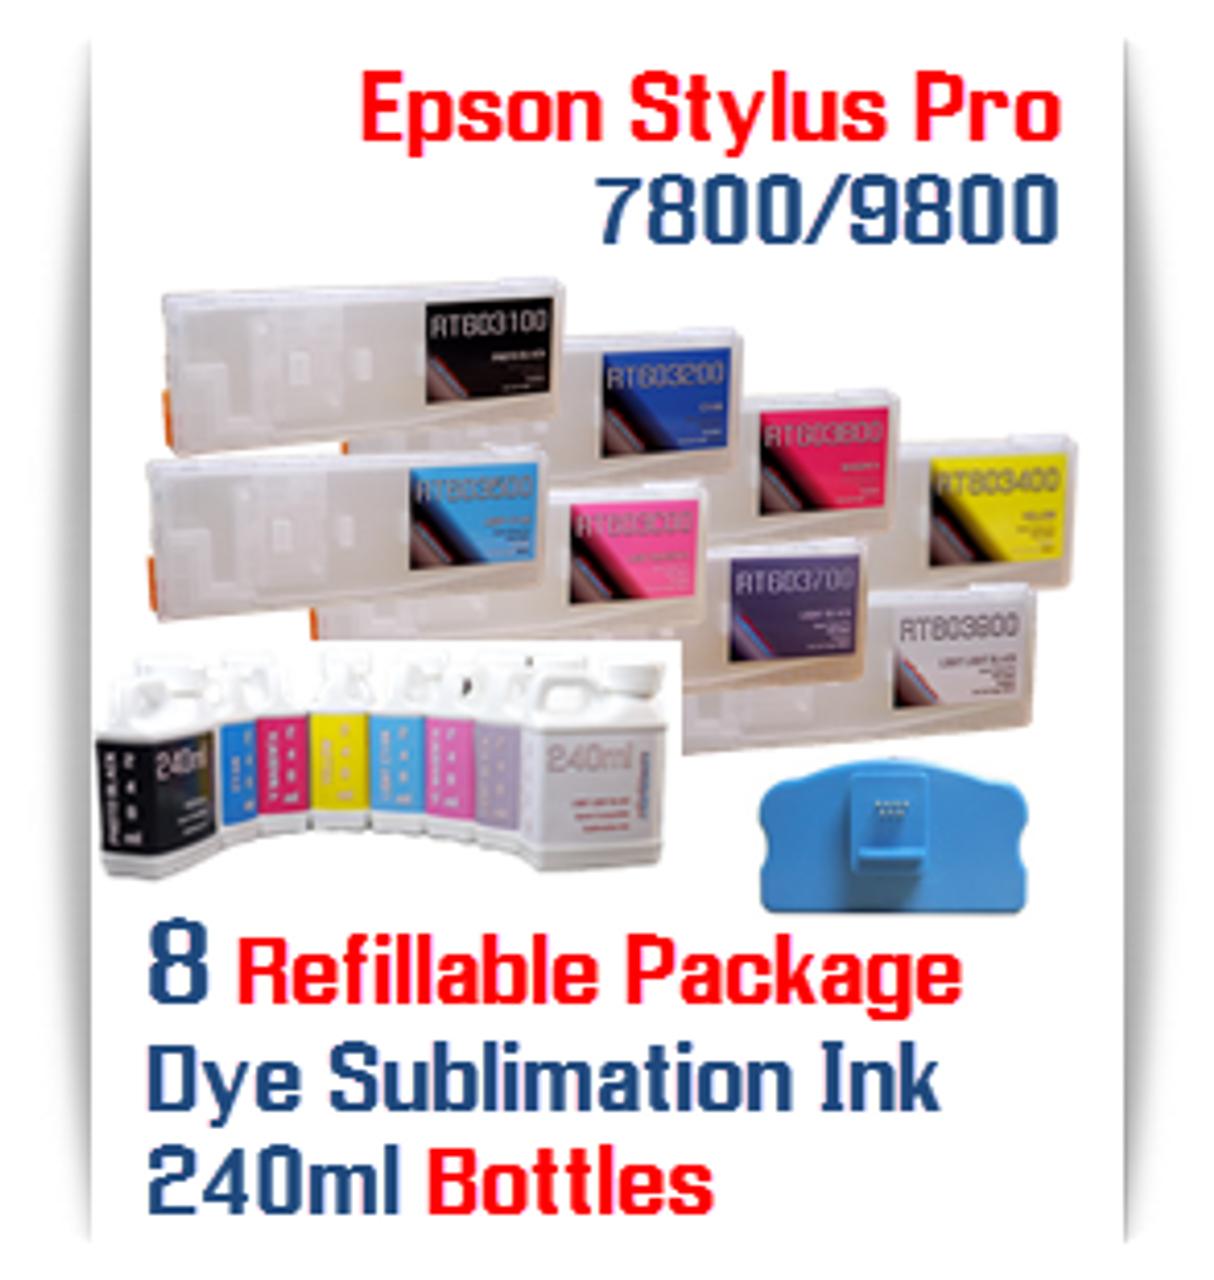 8 Refillable Cartridges, Dye Sublimation ink Epson Stylus Pro 7800, 9800